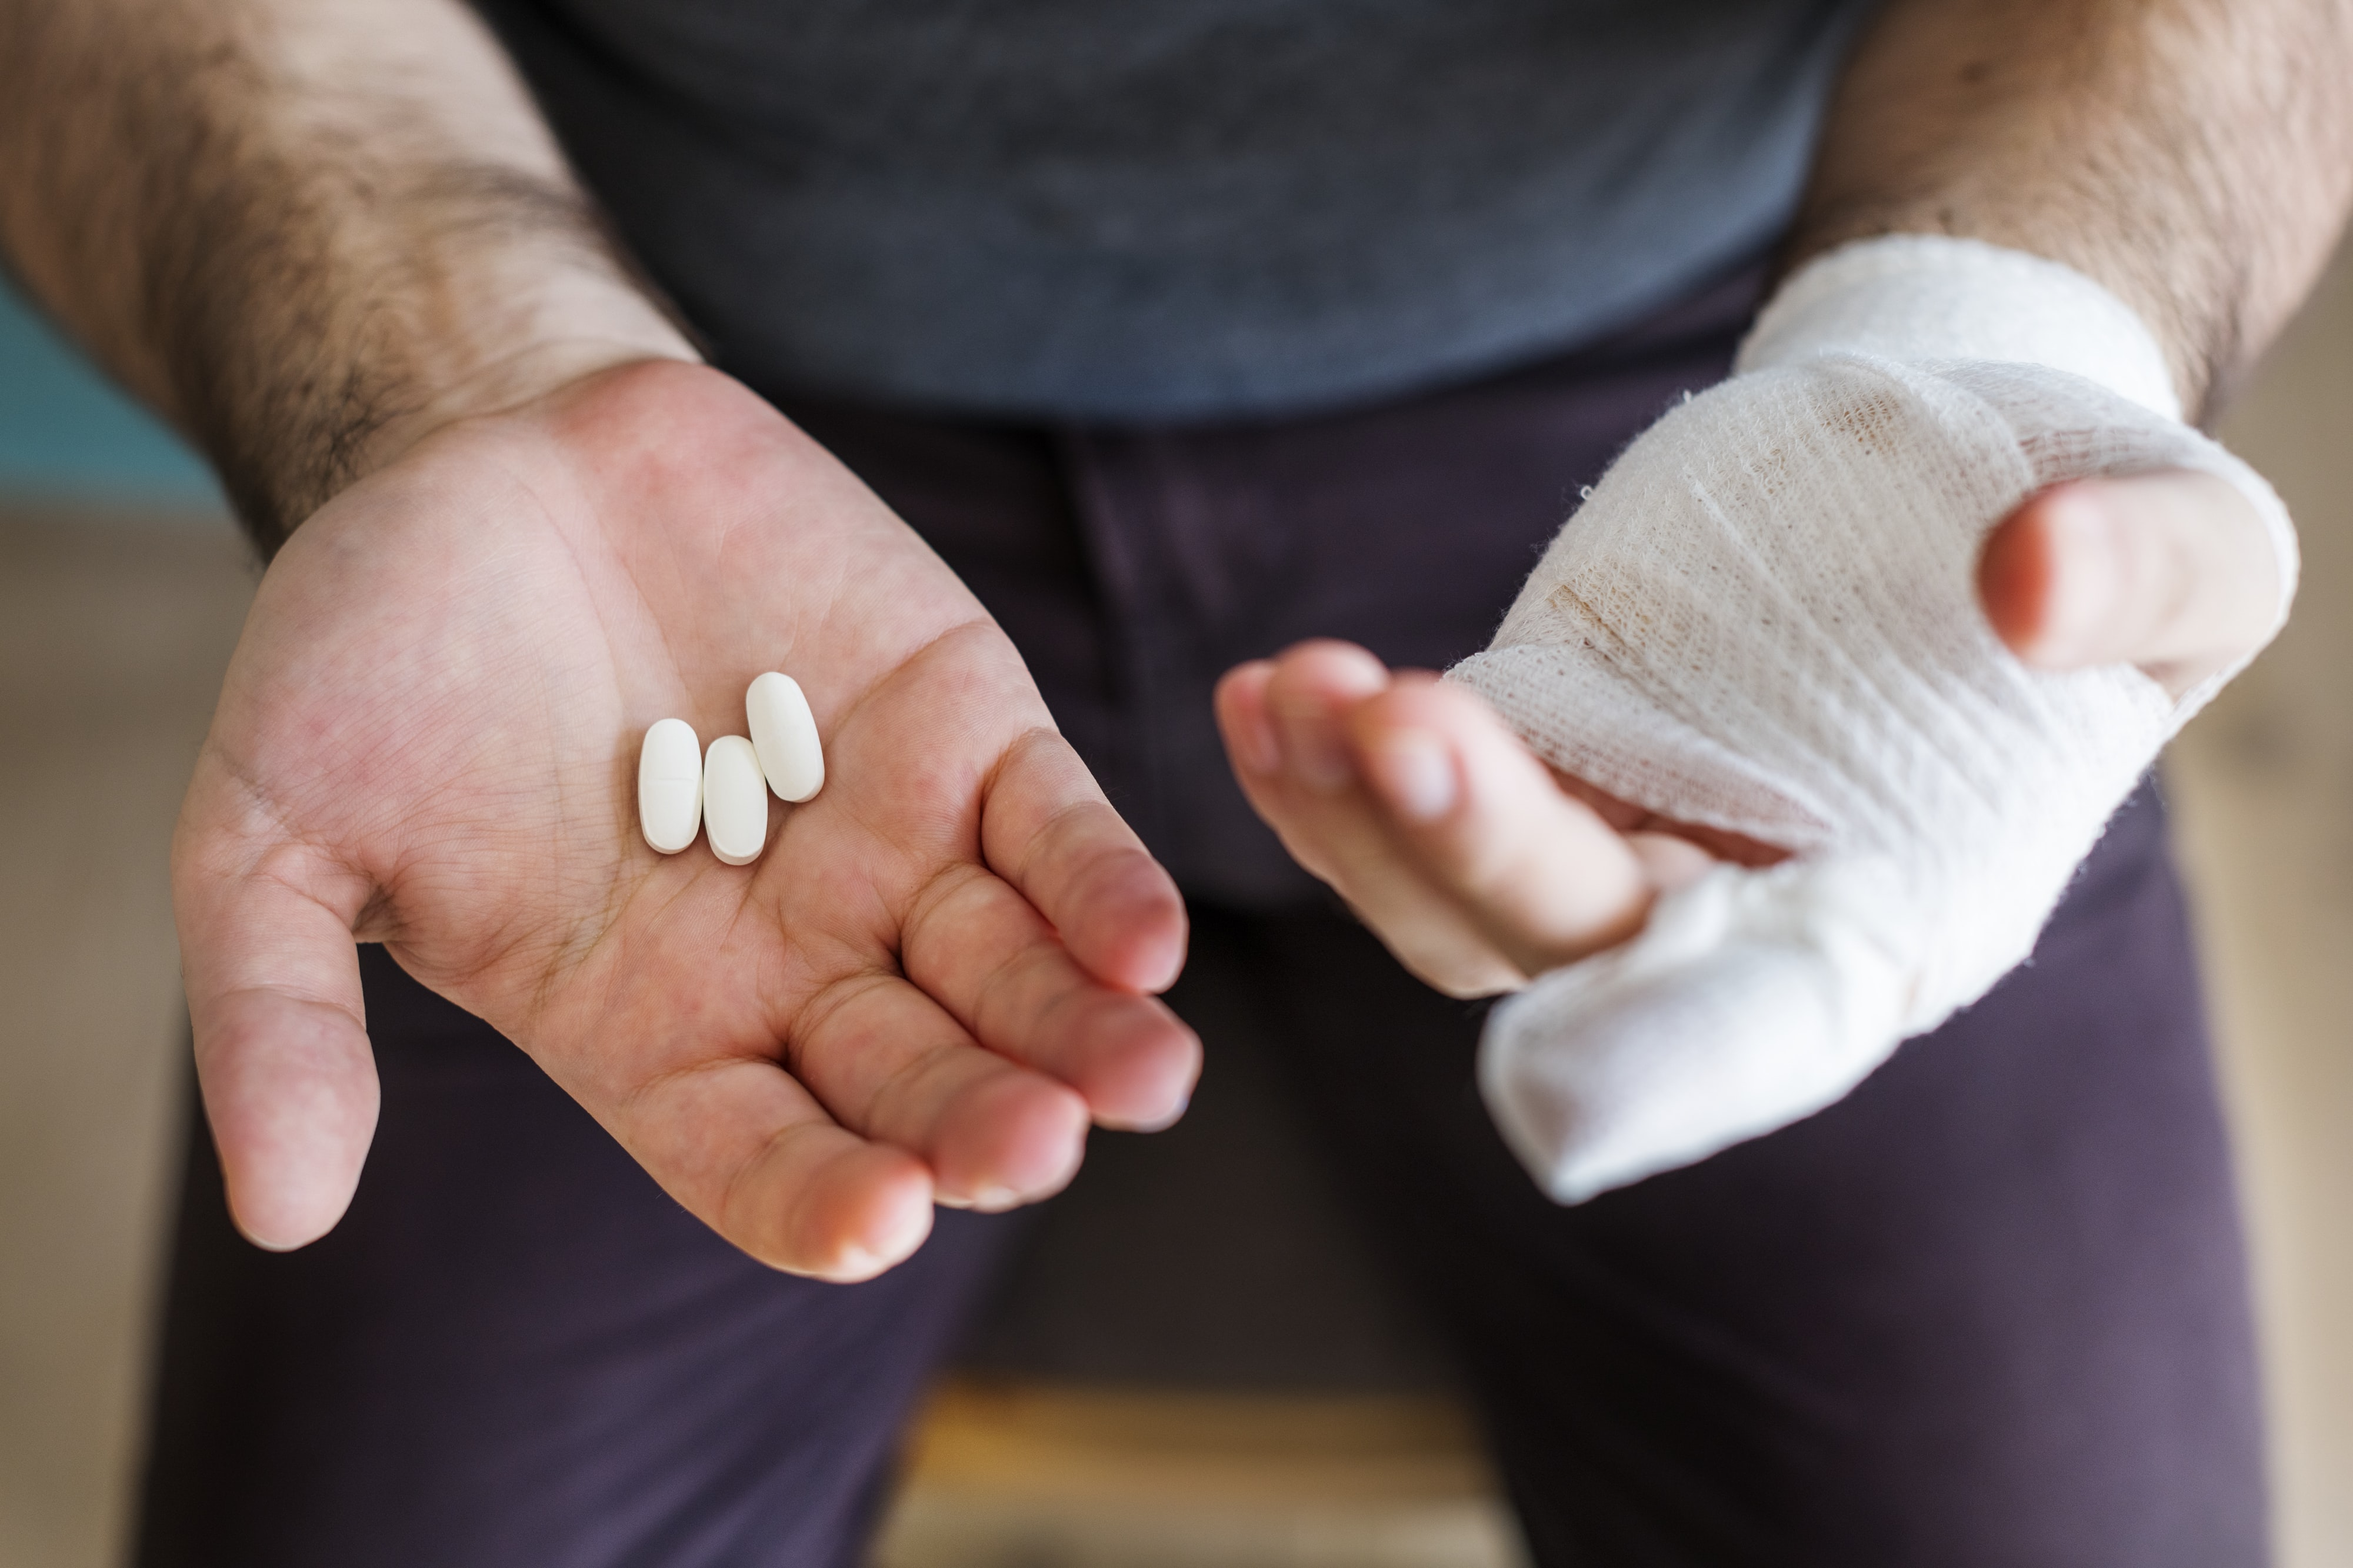 three white medicine tablets